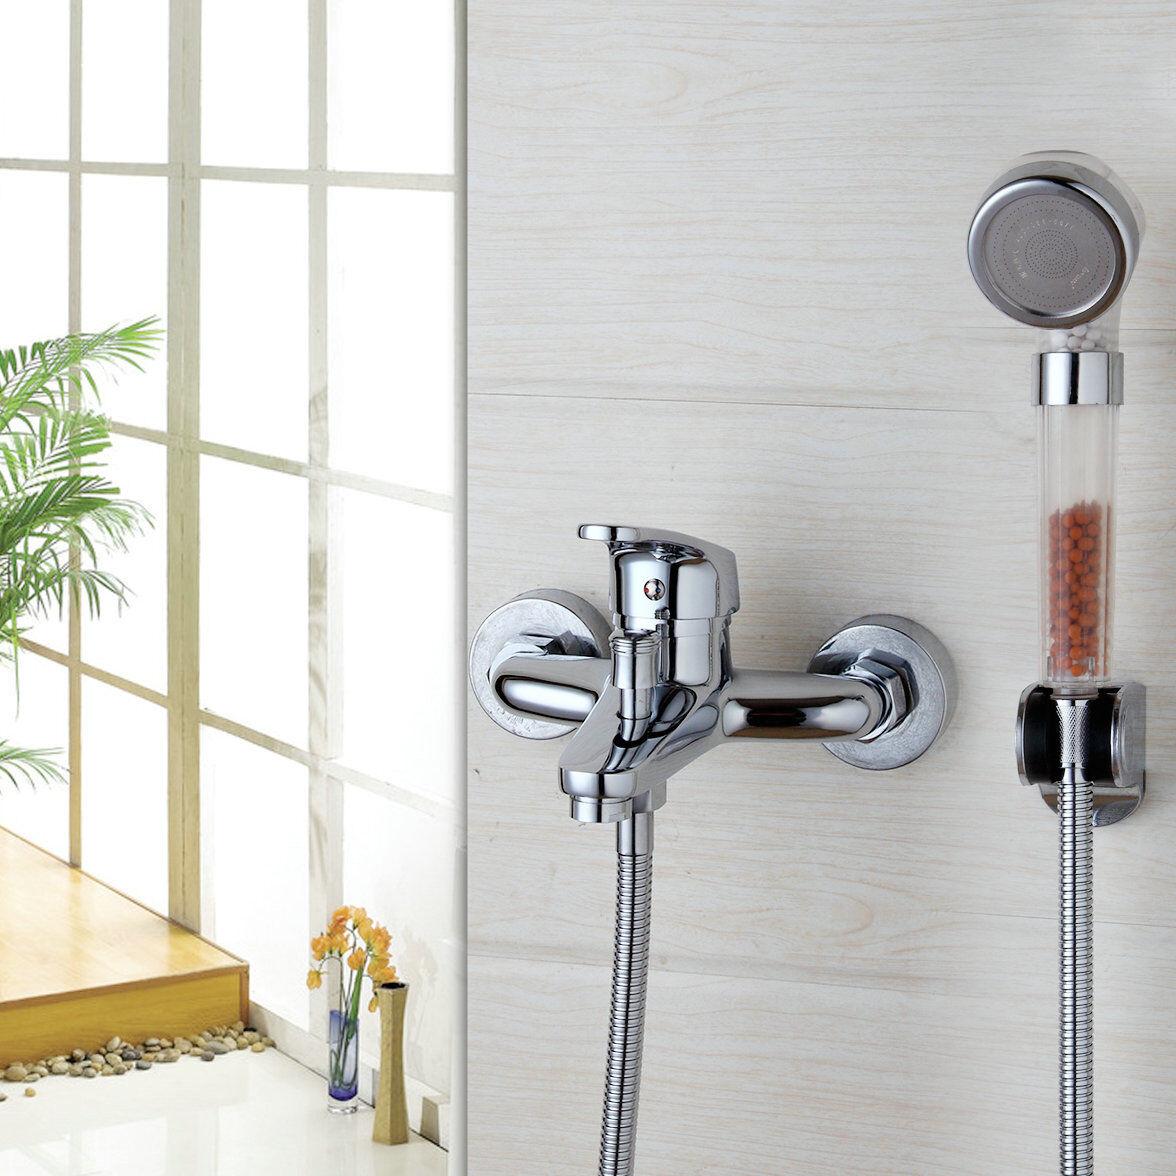 Wall Faucets Bathroom: Bathroom Mixer Wall Mounted Bathtub Tap Chrome Brass Bath